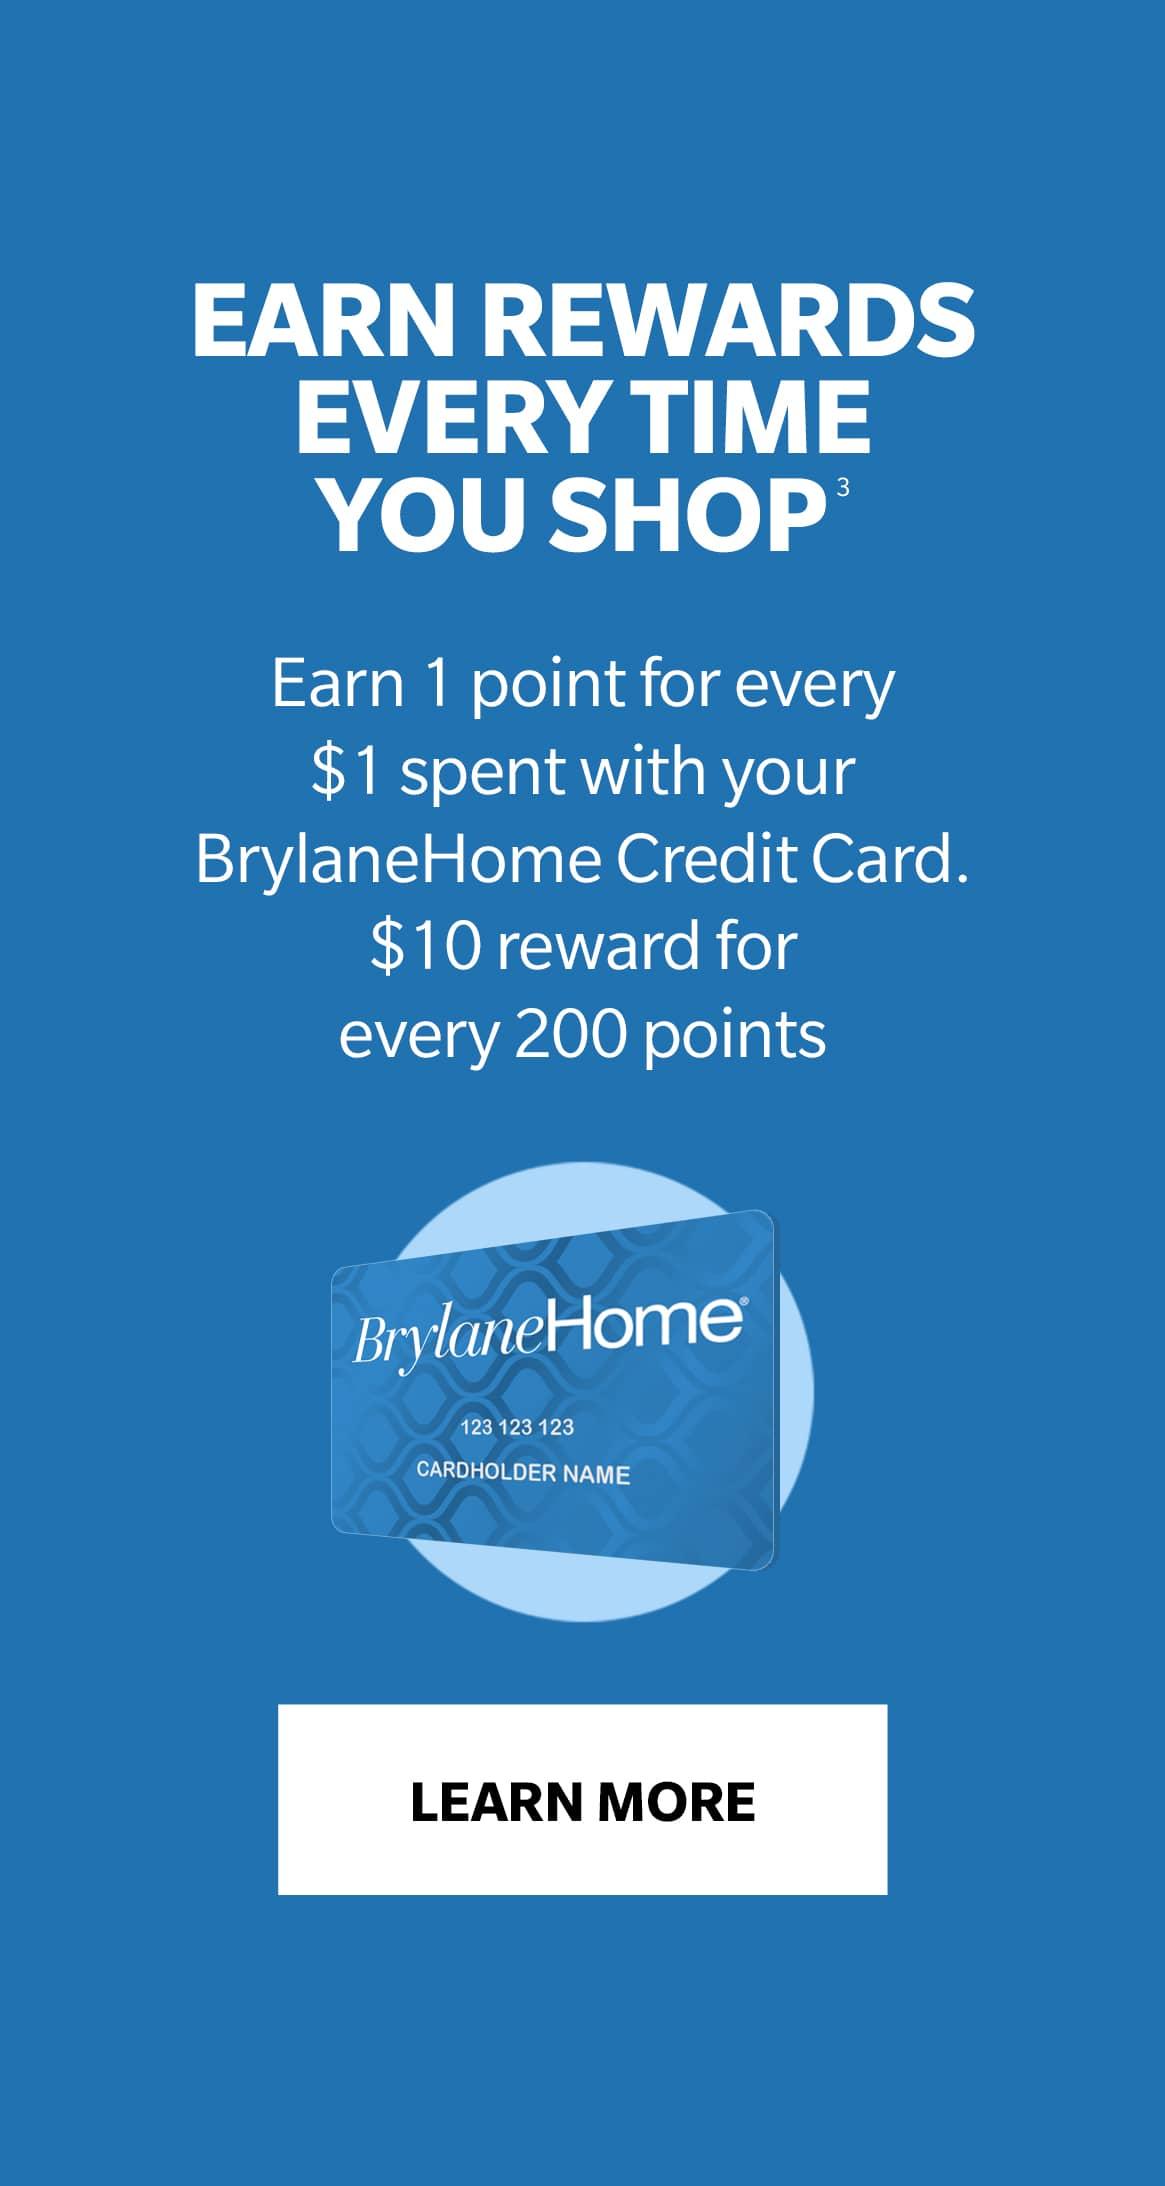 BrylaneHome Credit Card image